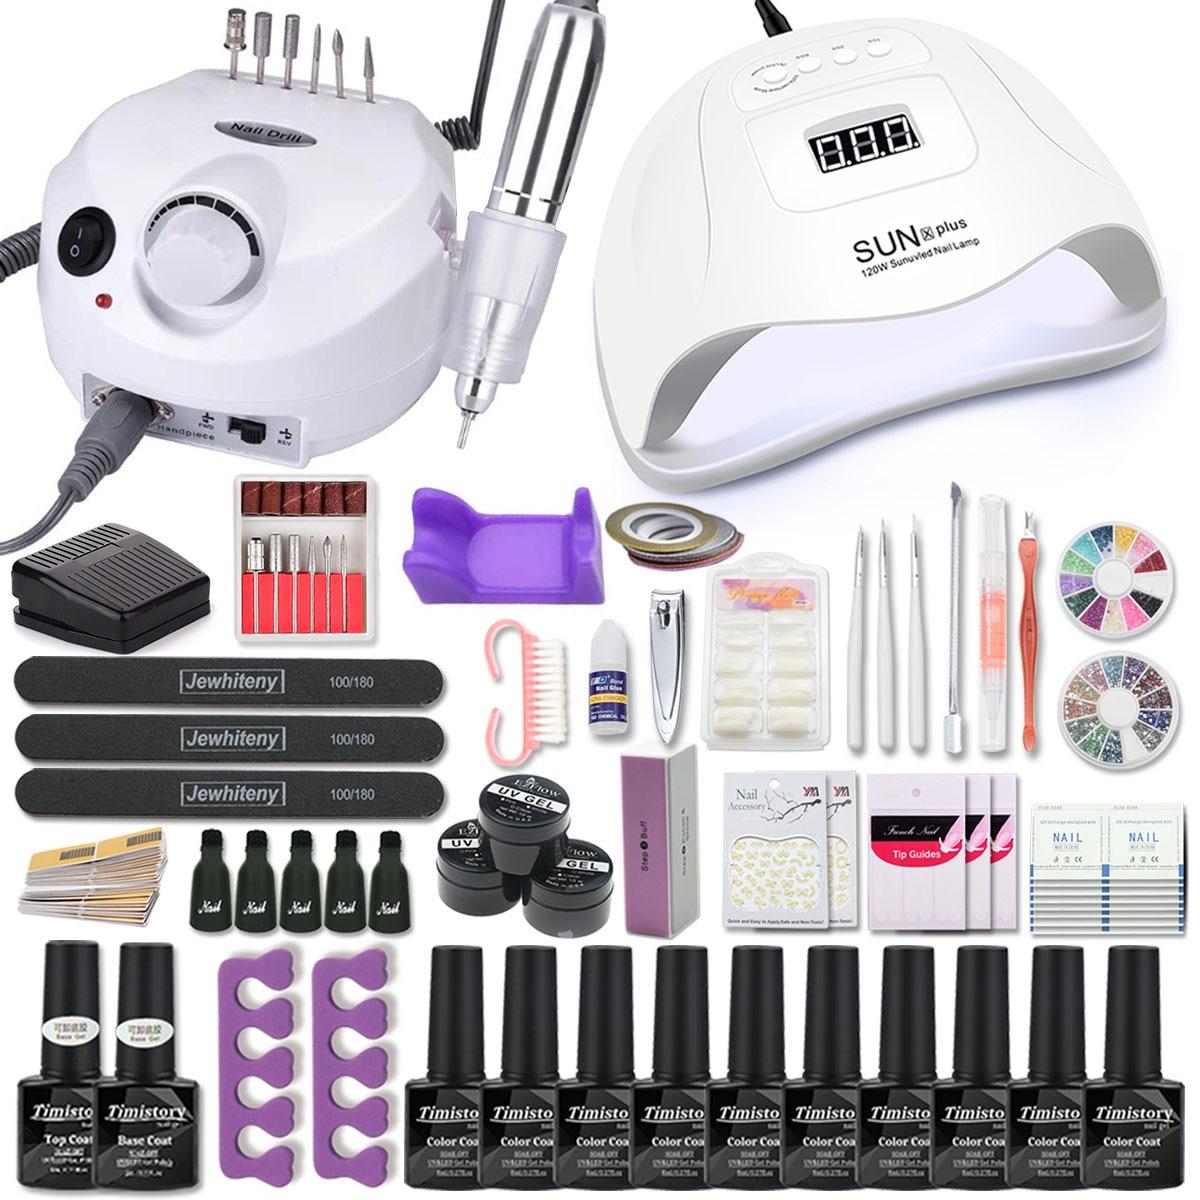 Manicure Set For Nail Set 120/80/54W UV LED LAMP Gel Nail Polish Set Kit Electric Nail Drill Manicure Sets Nail Art Tools